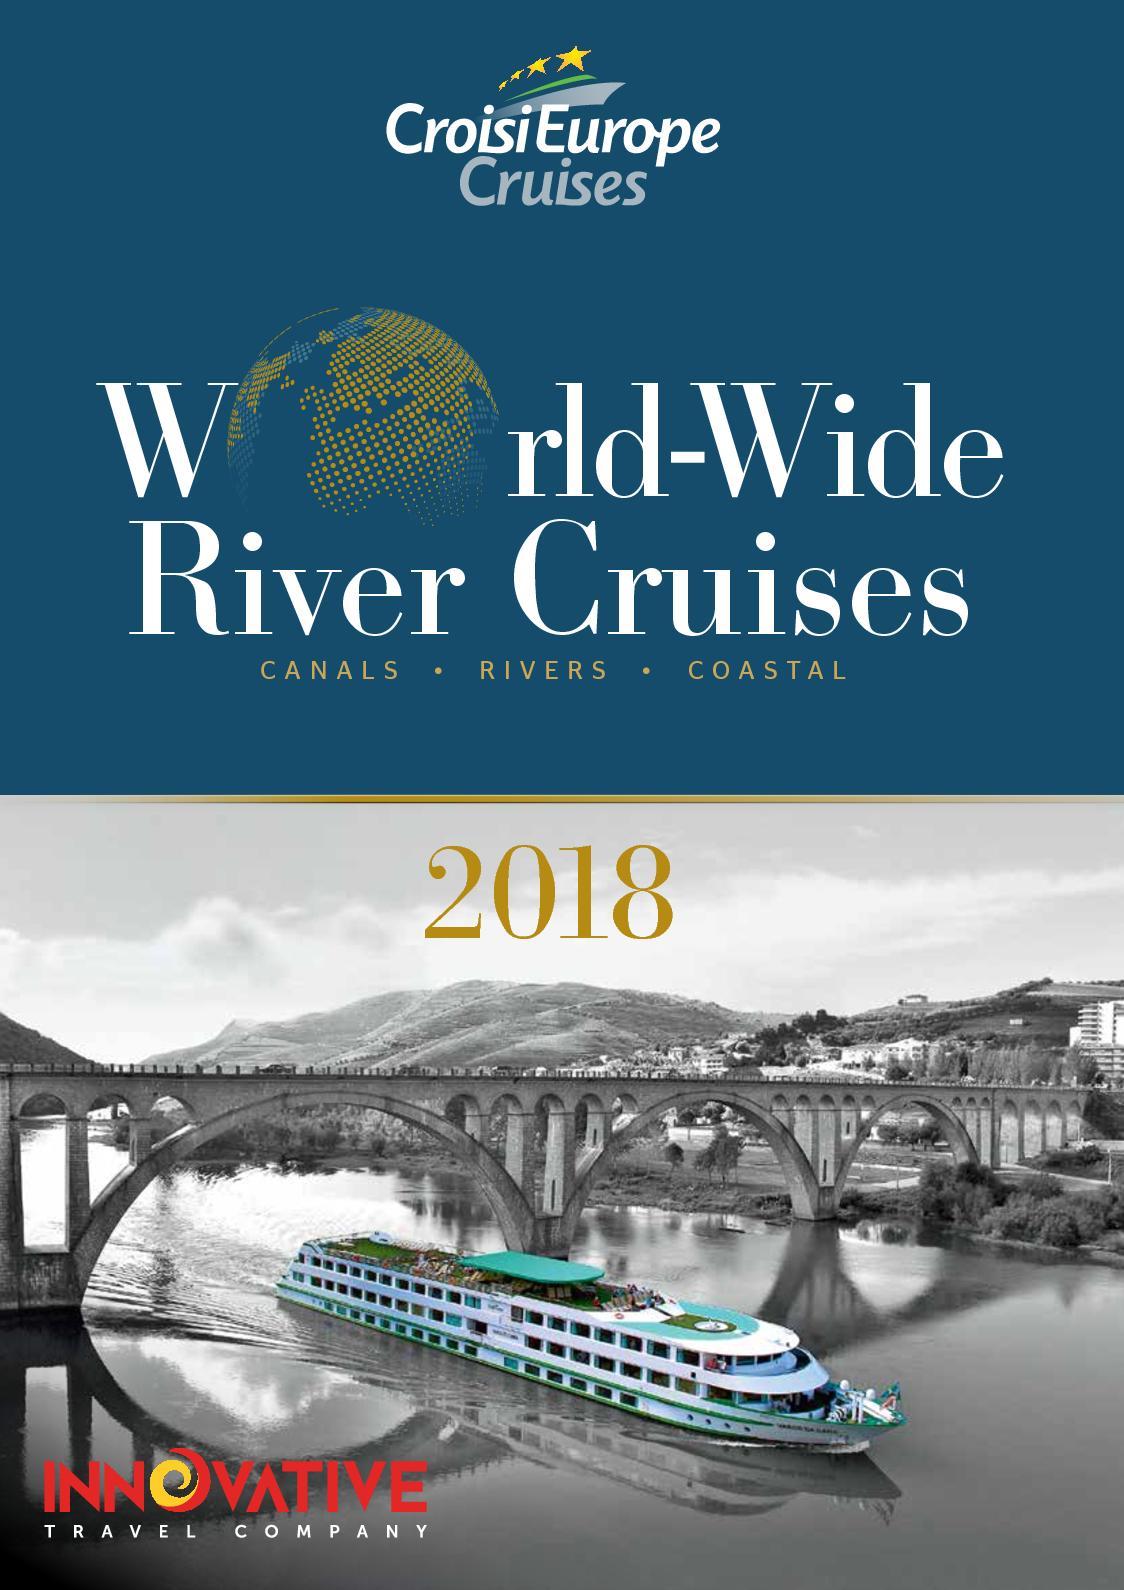 2f9f77eea115 Calaméo - CroisiEurope 2018 World-Wide River Cruises